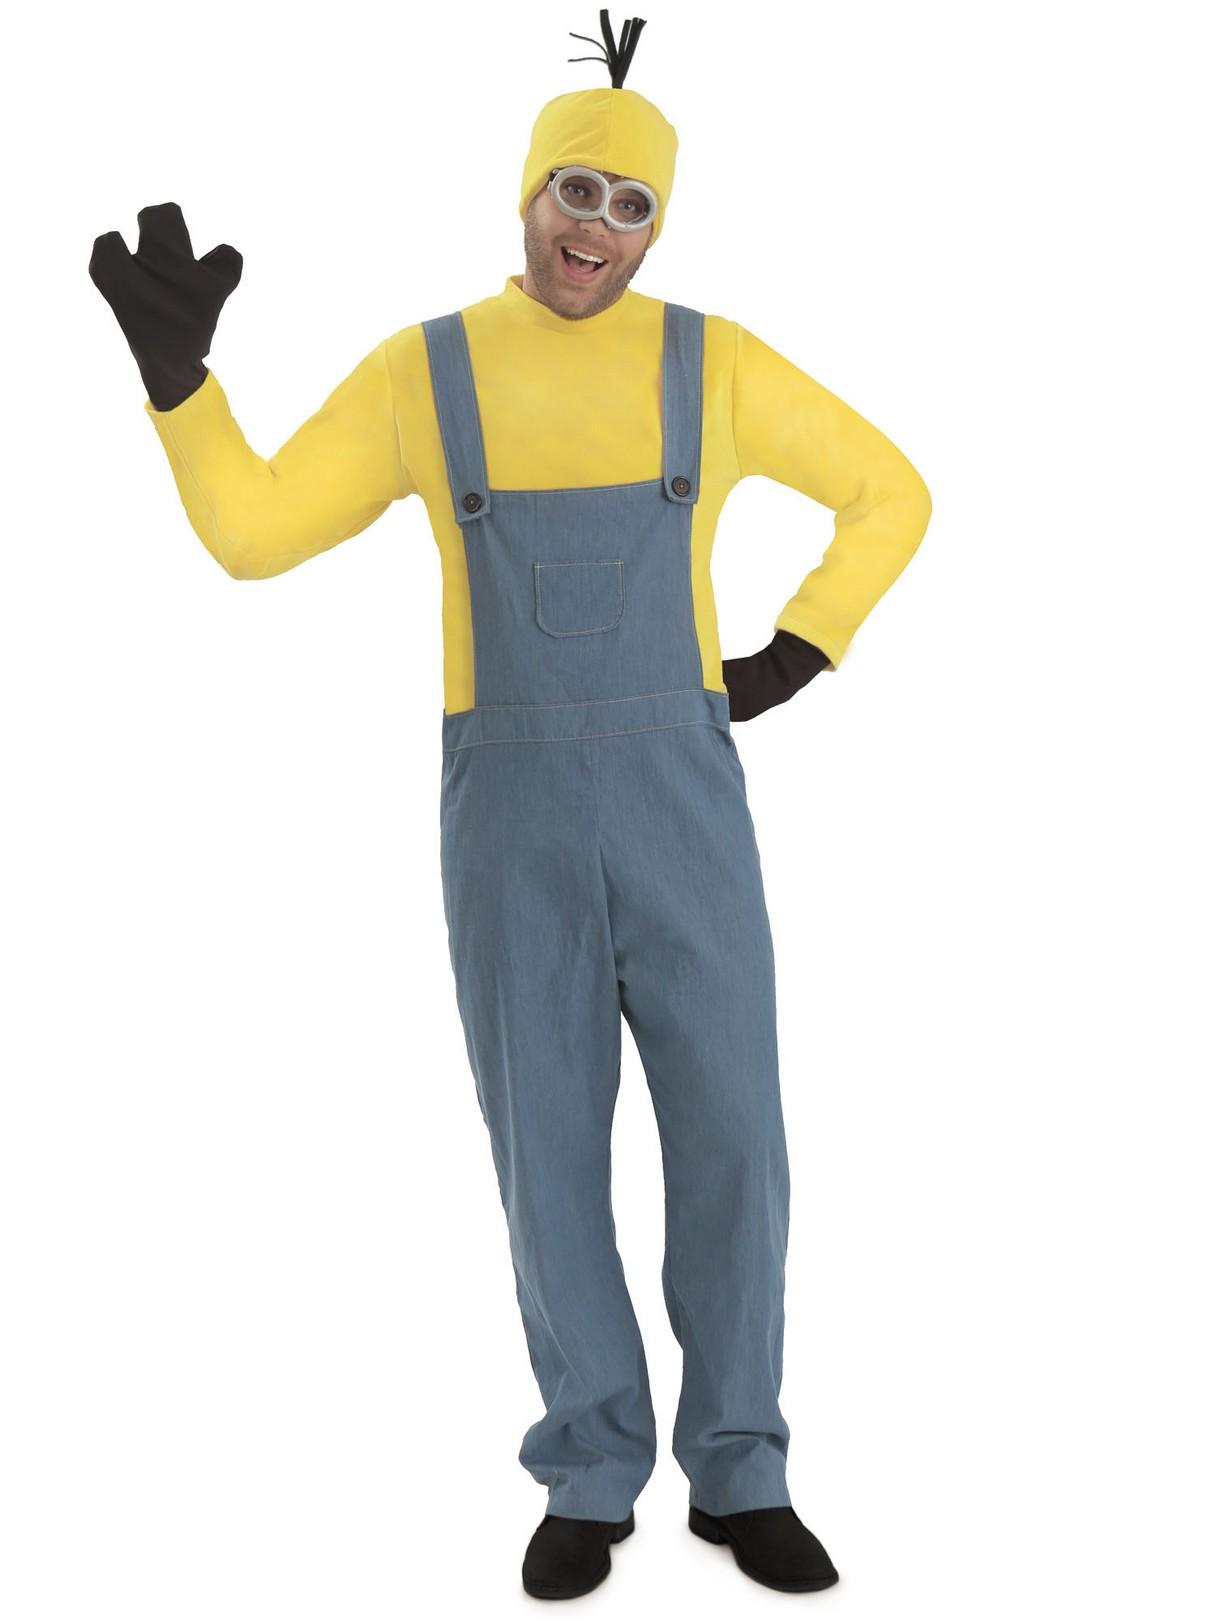 minions kevin jumpsuit plus costume | buycostumes